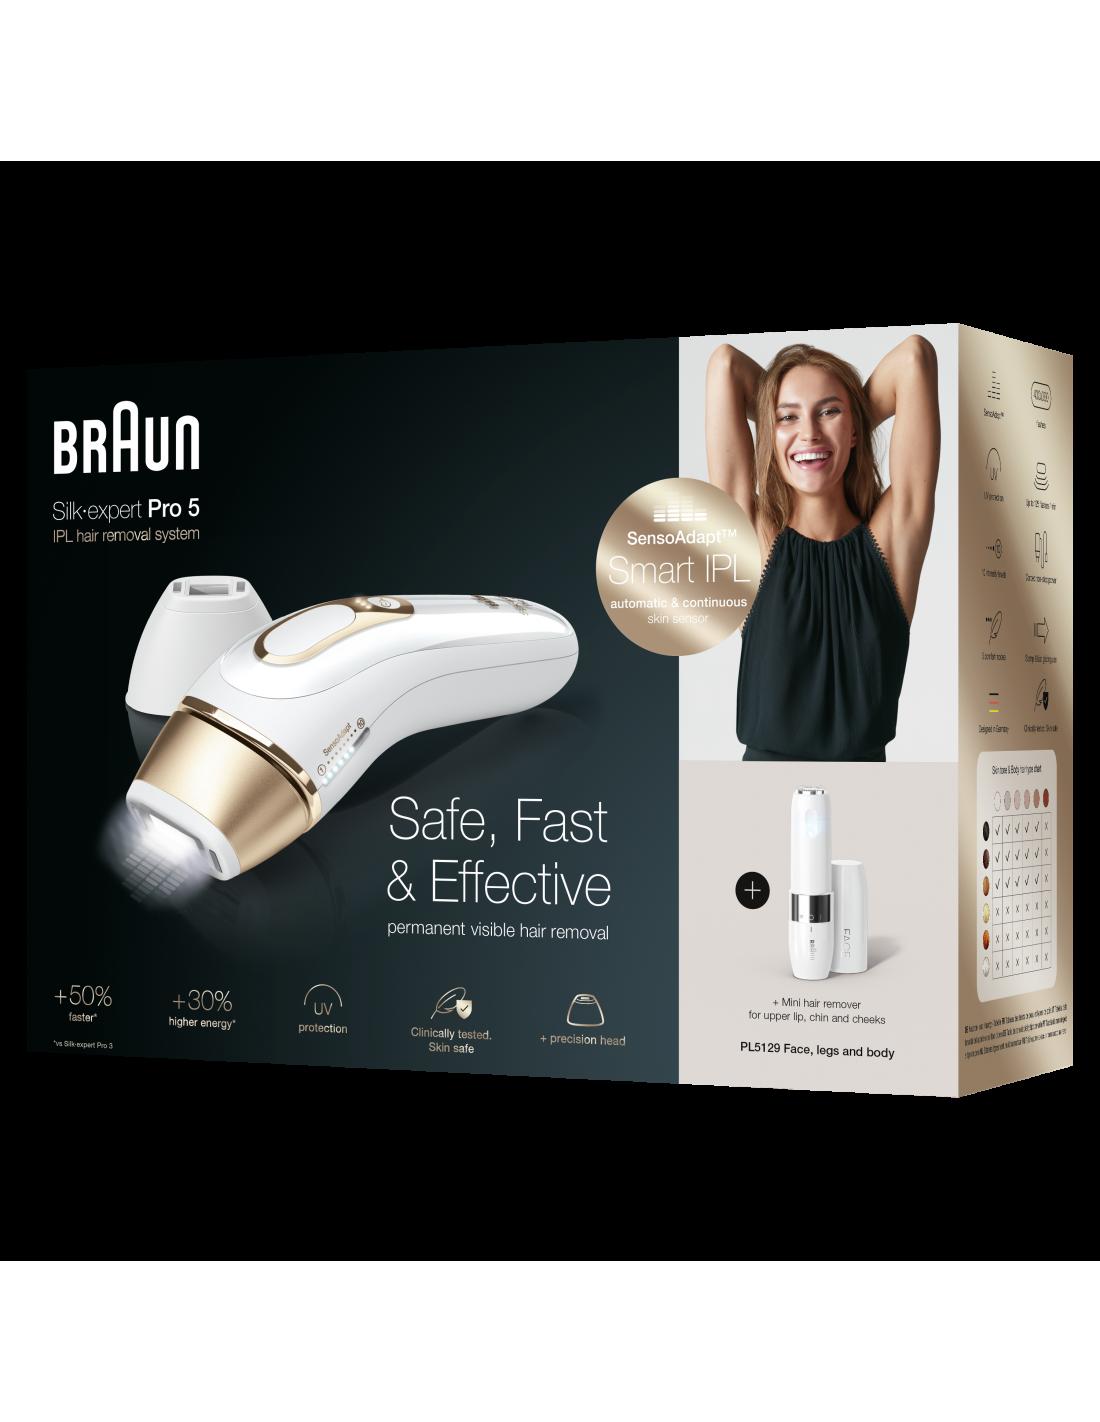 Braun Silk-expert Pro PL 5129 Epilators